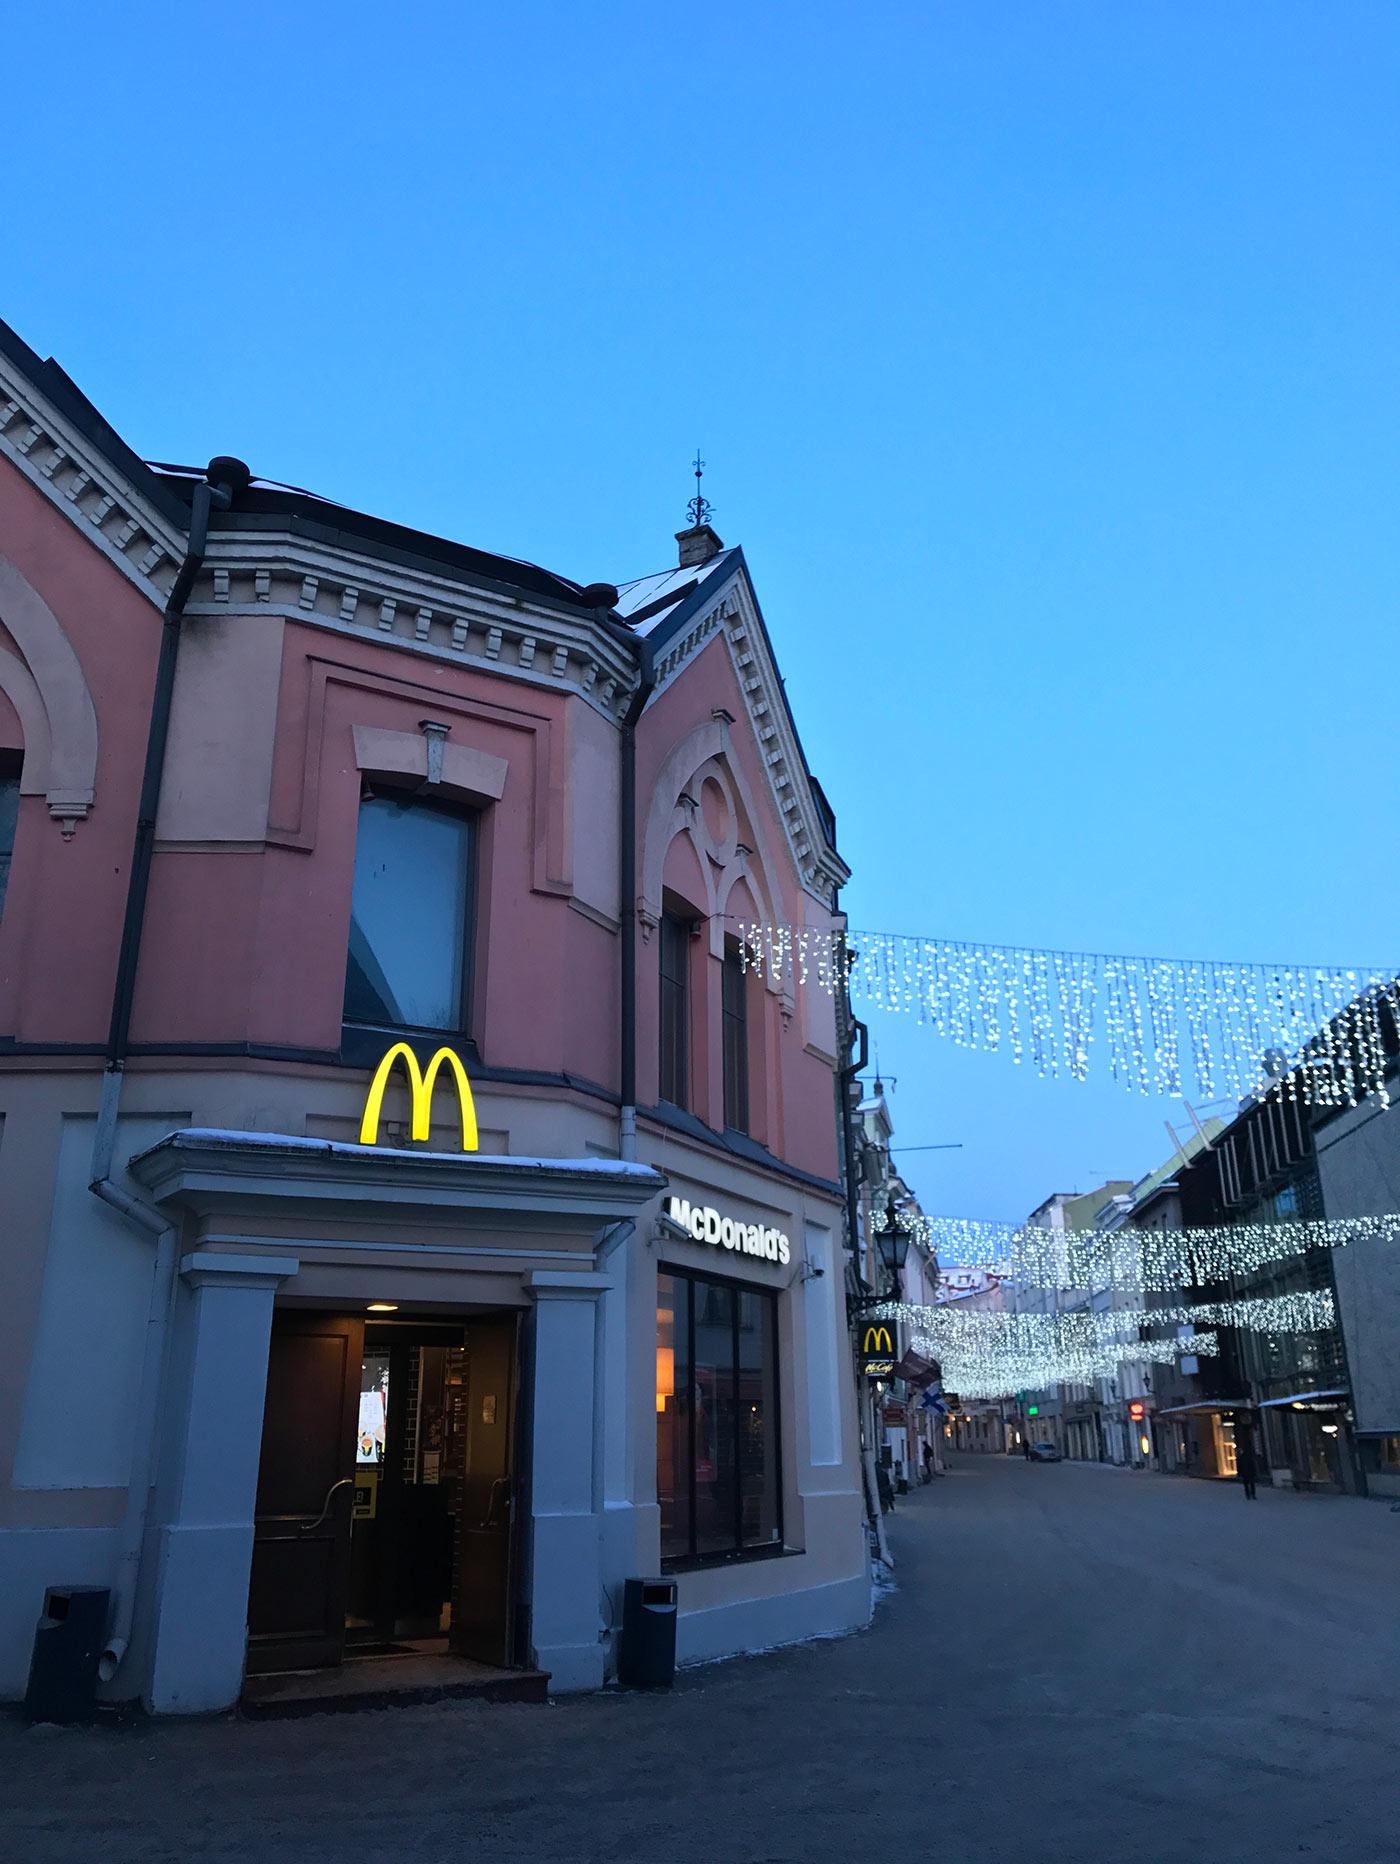 Mcdonalds Viru Gates in Tallinn